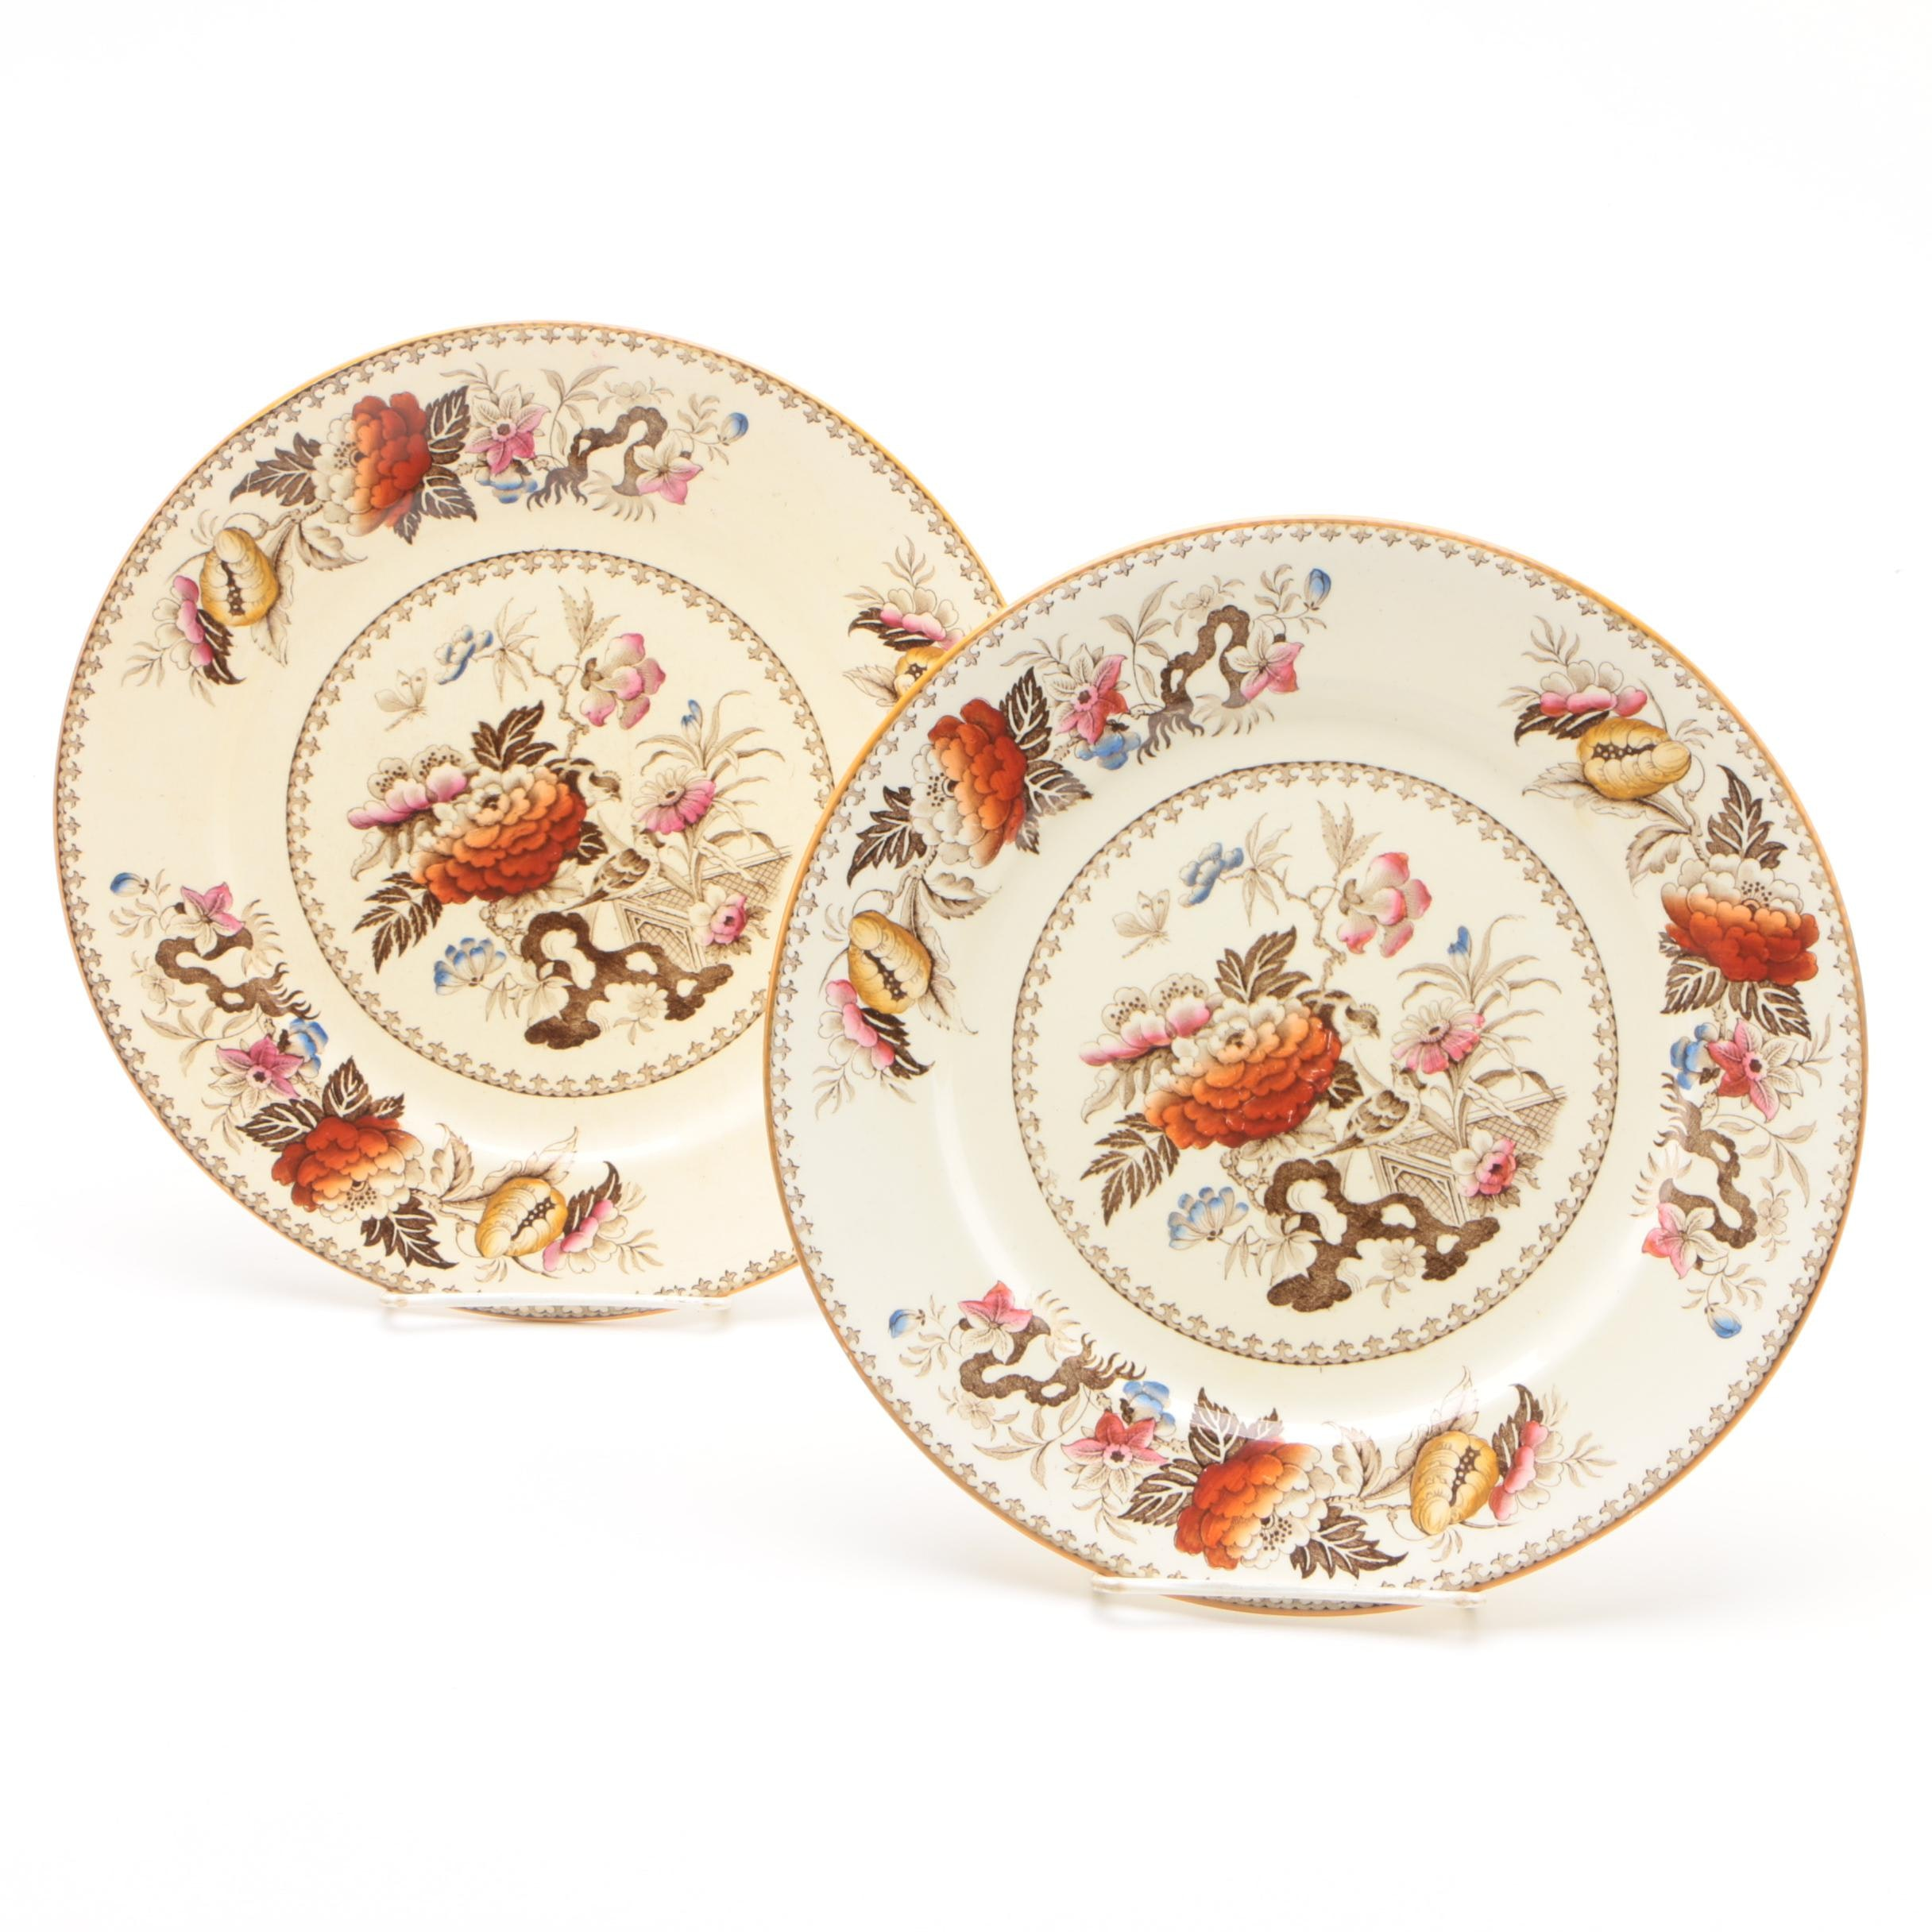 "Wedgwood ""Bullfinch"" Transfer-Printed Dinner Plates"